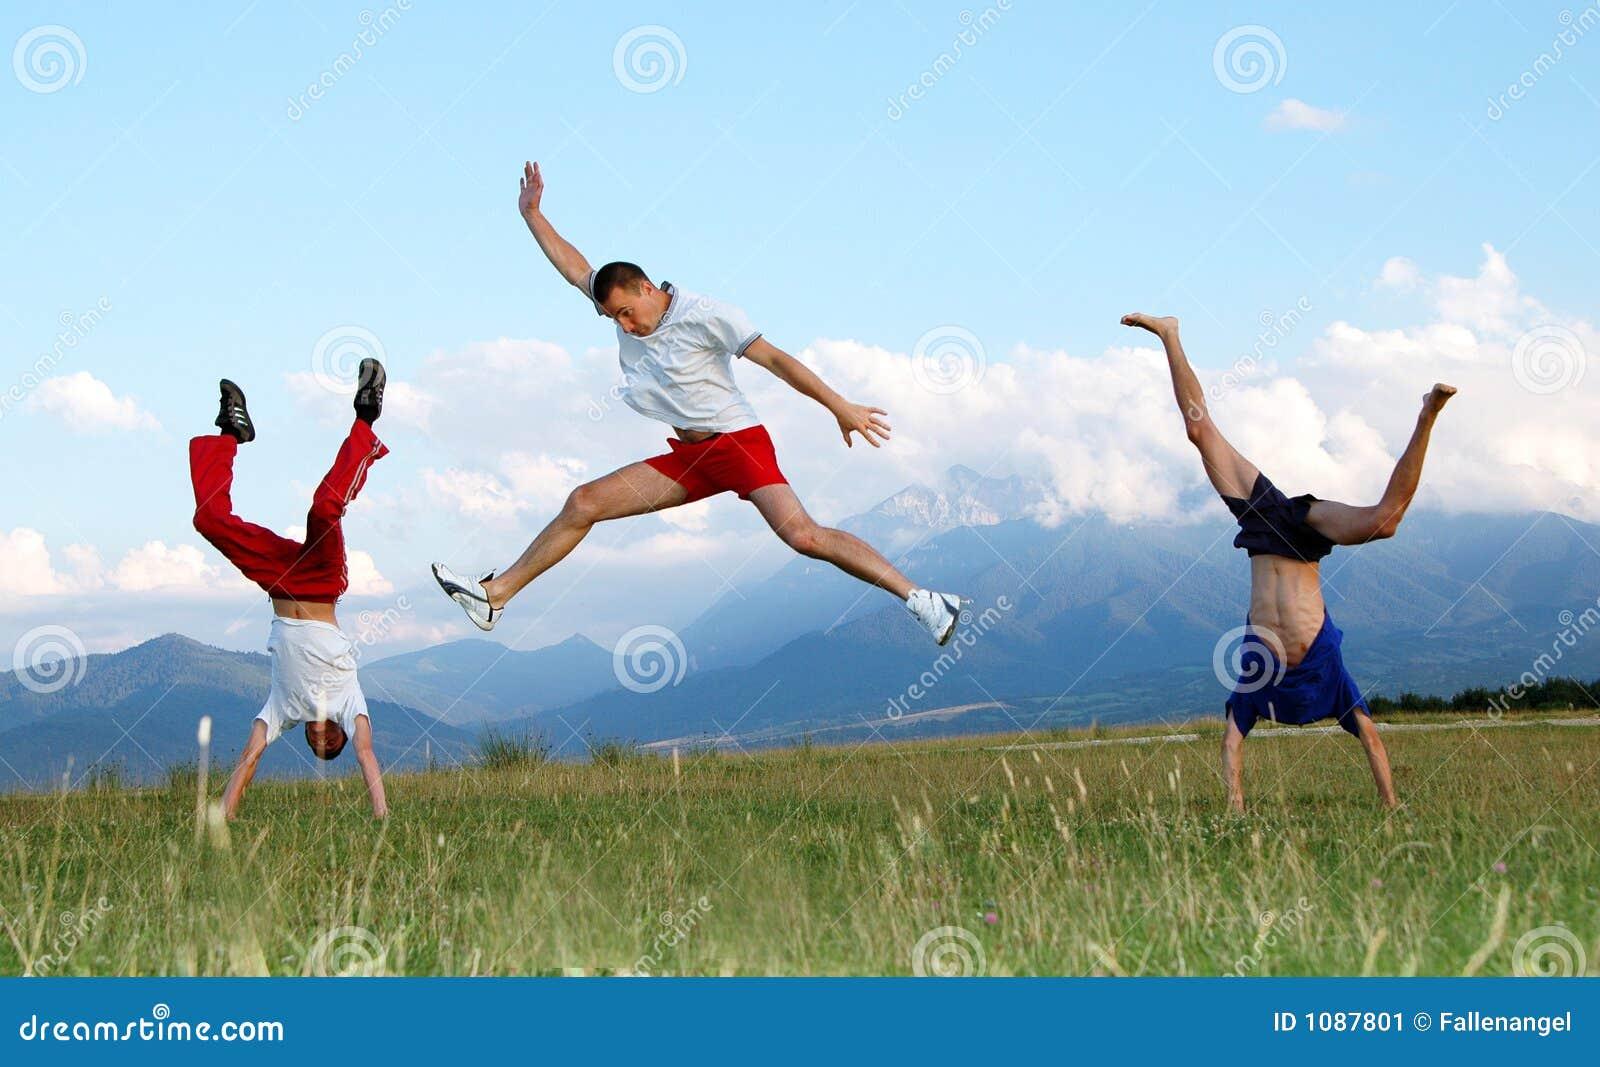 jump for joy stock image image 1087801